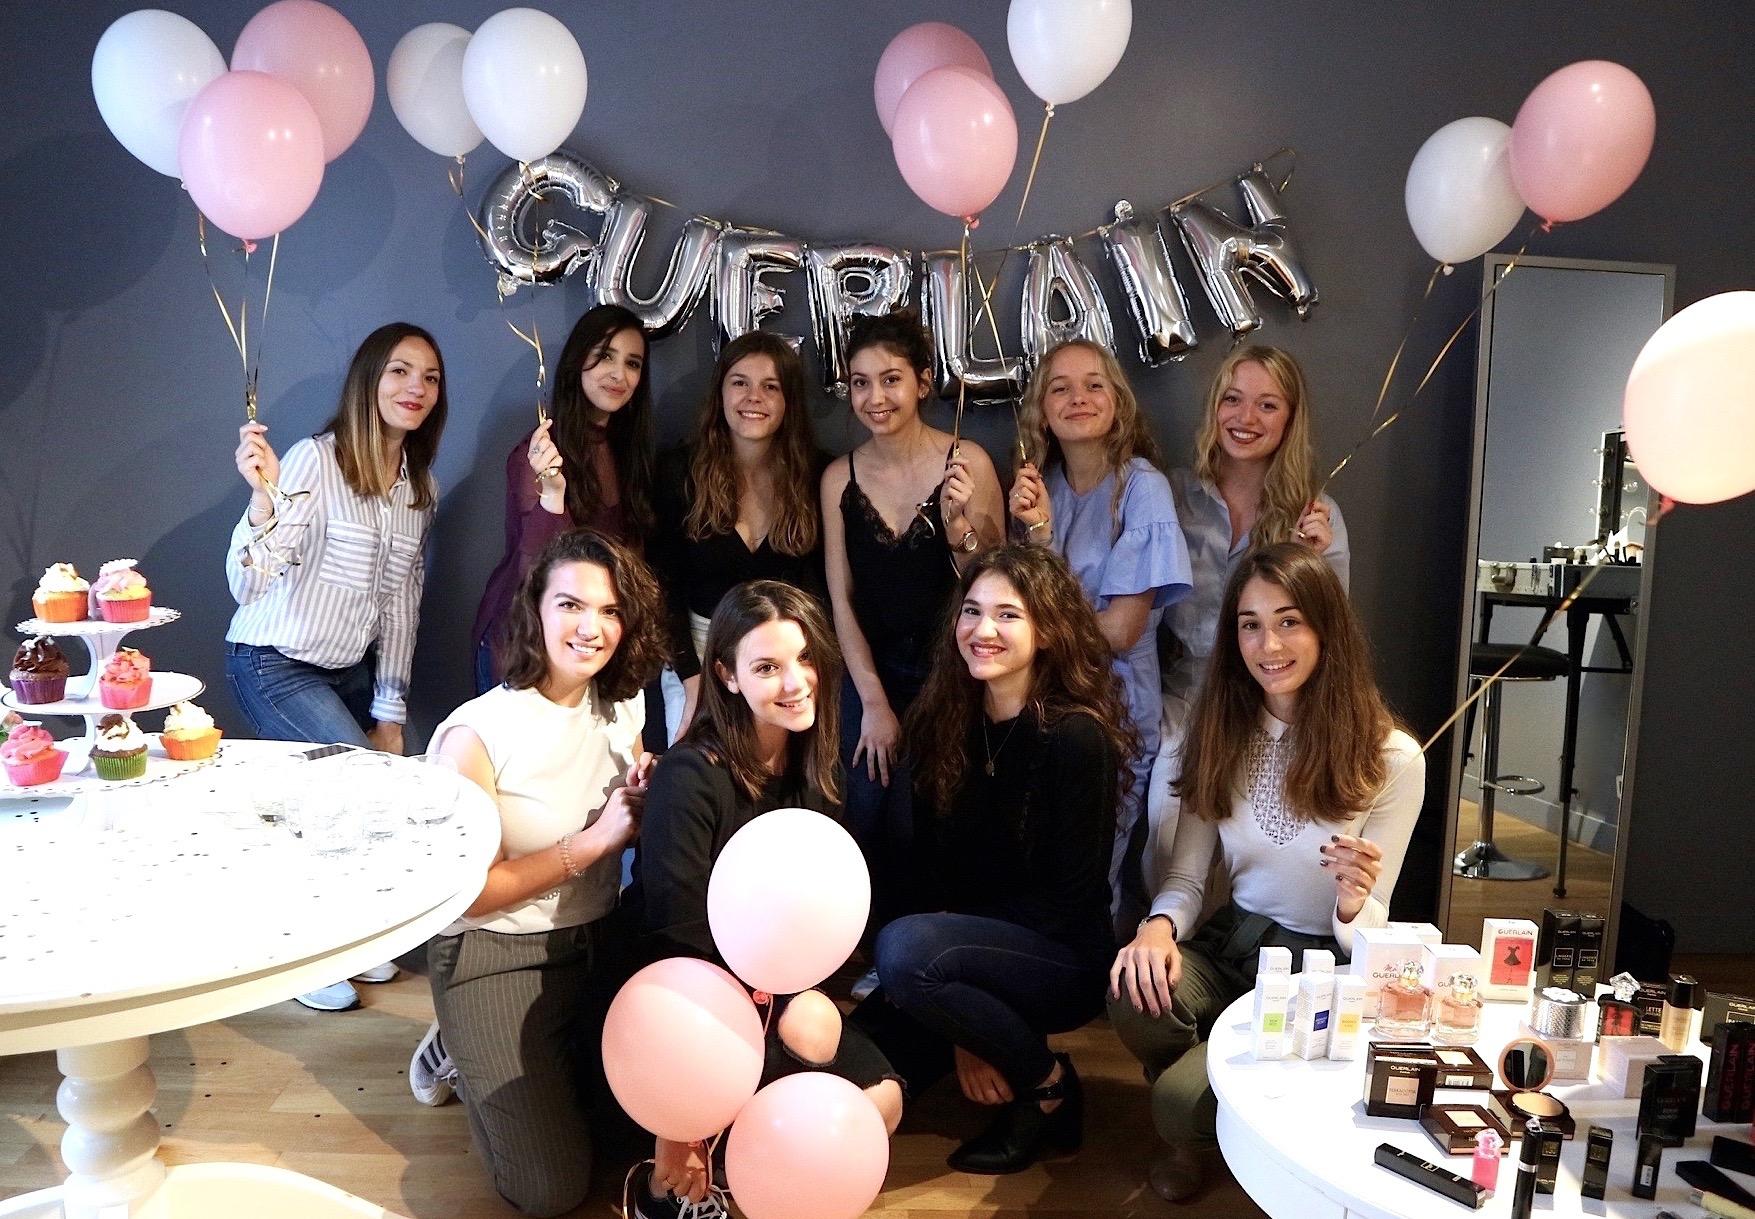 Guerlain party (1)